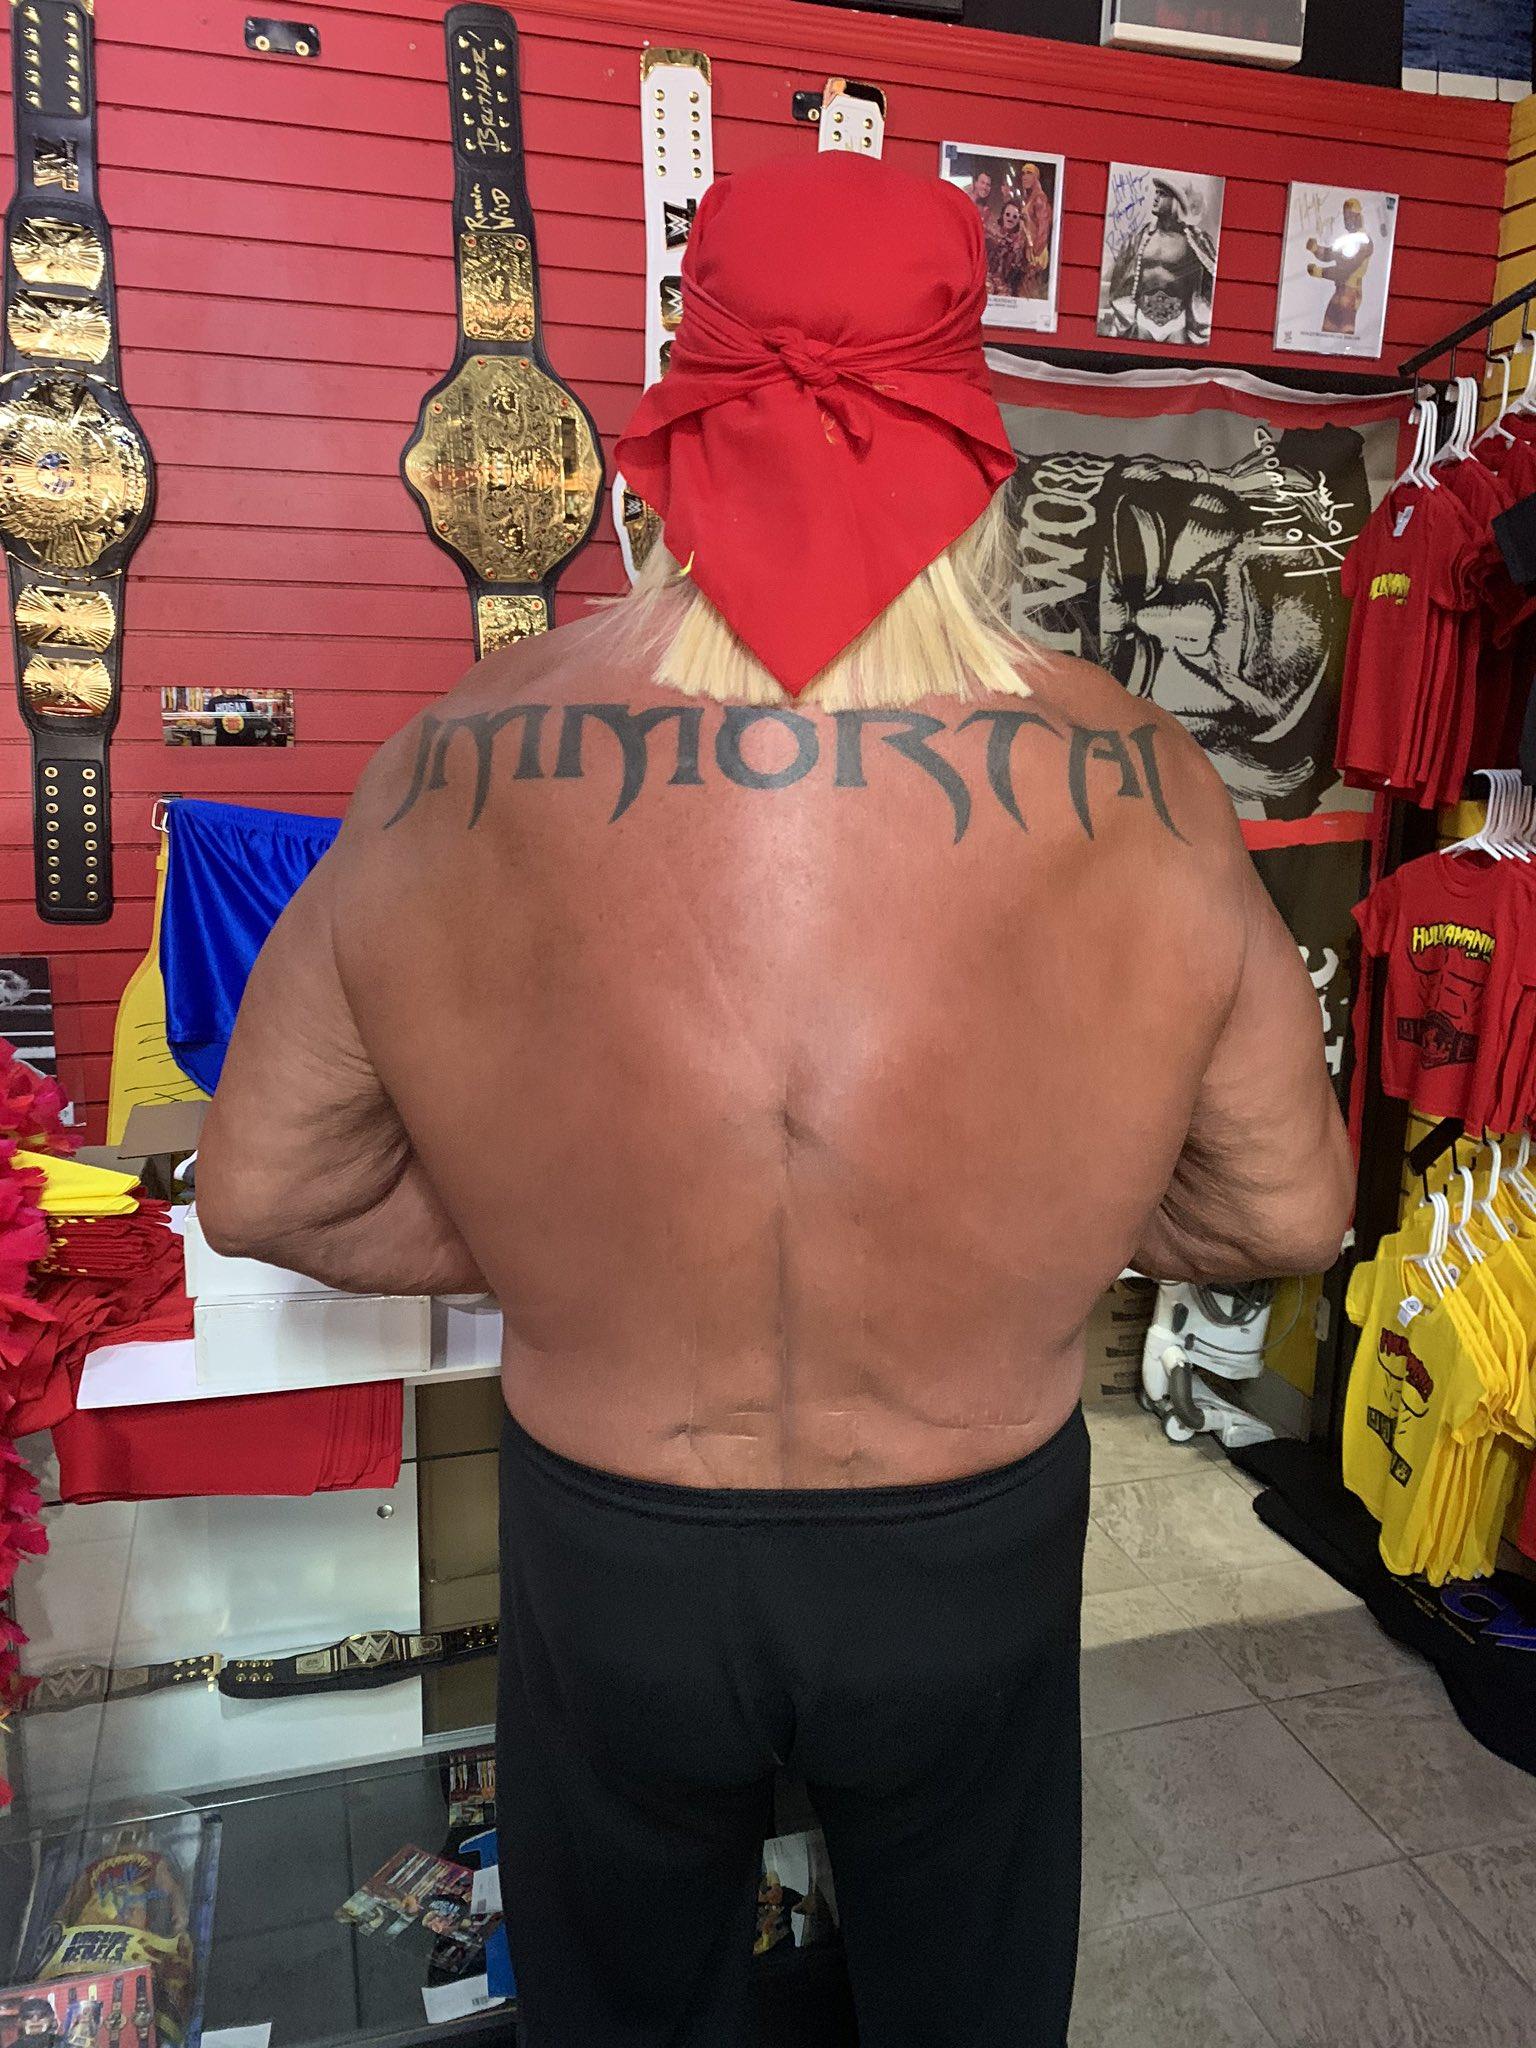 Hulk Hogan on Twitter: